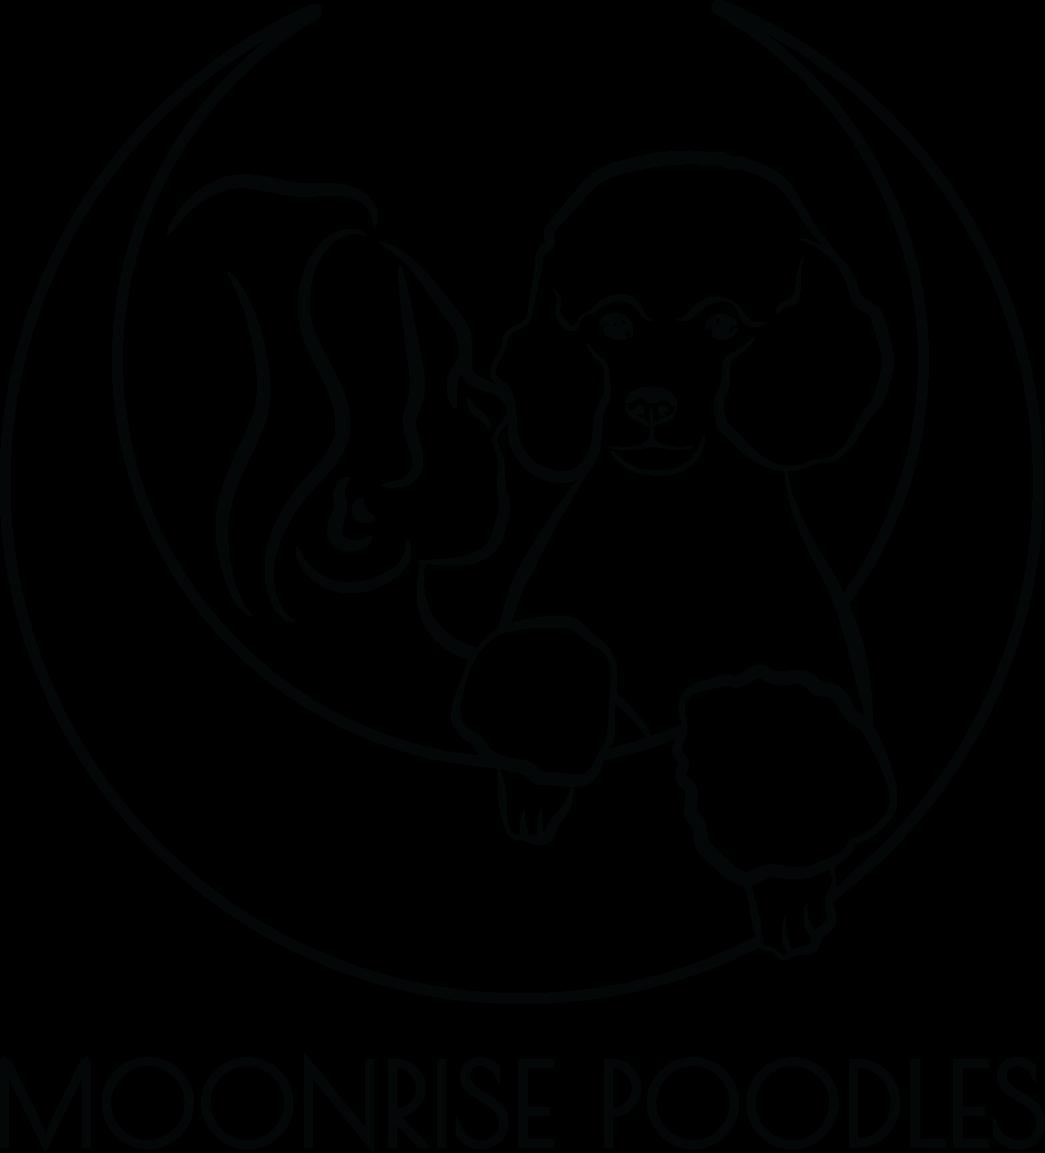 moonrisepoodles.com